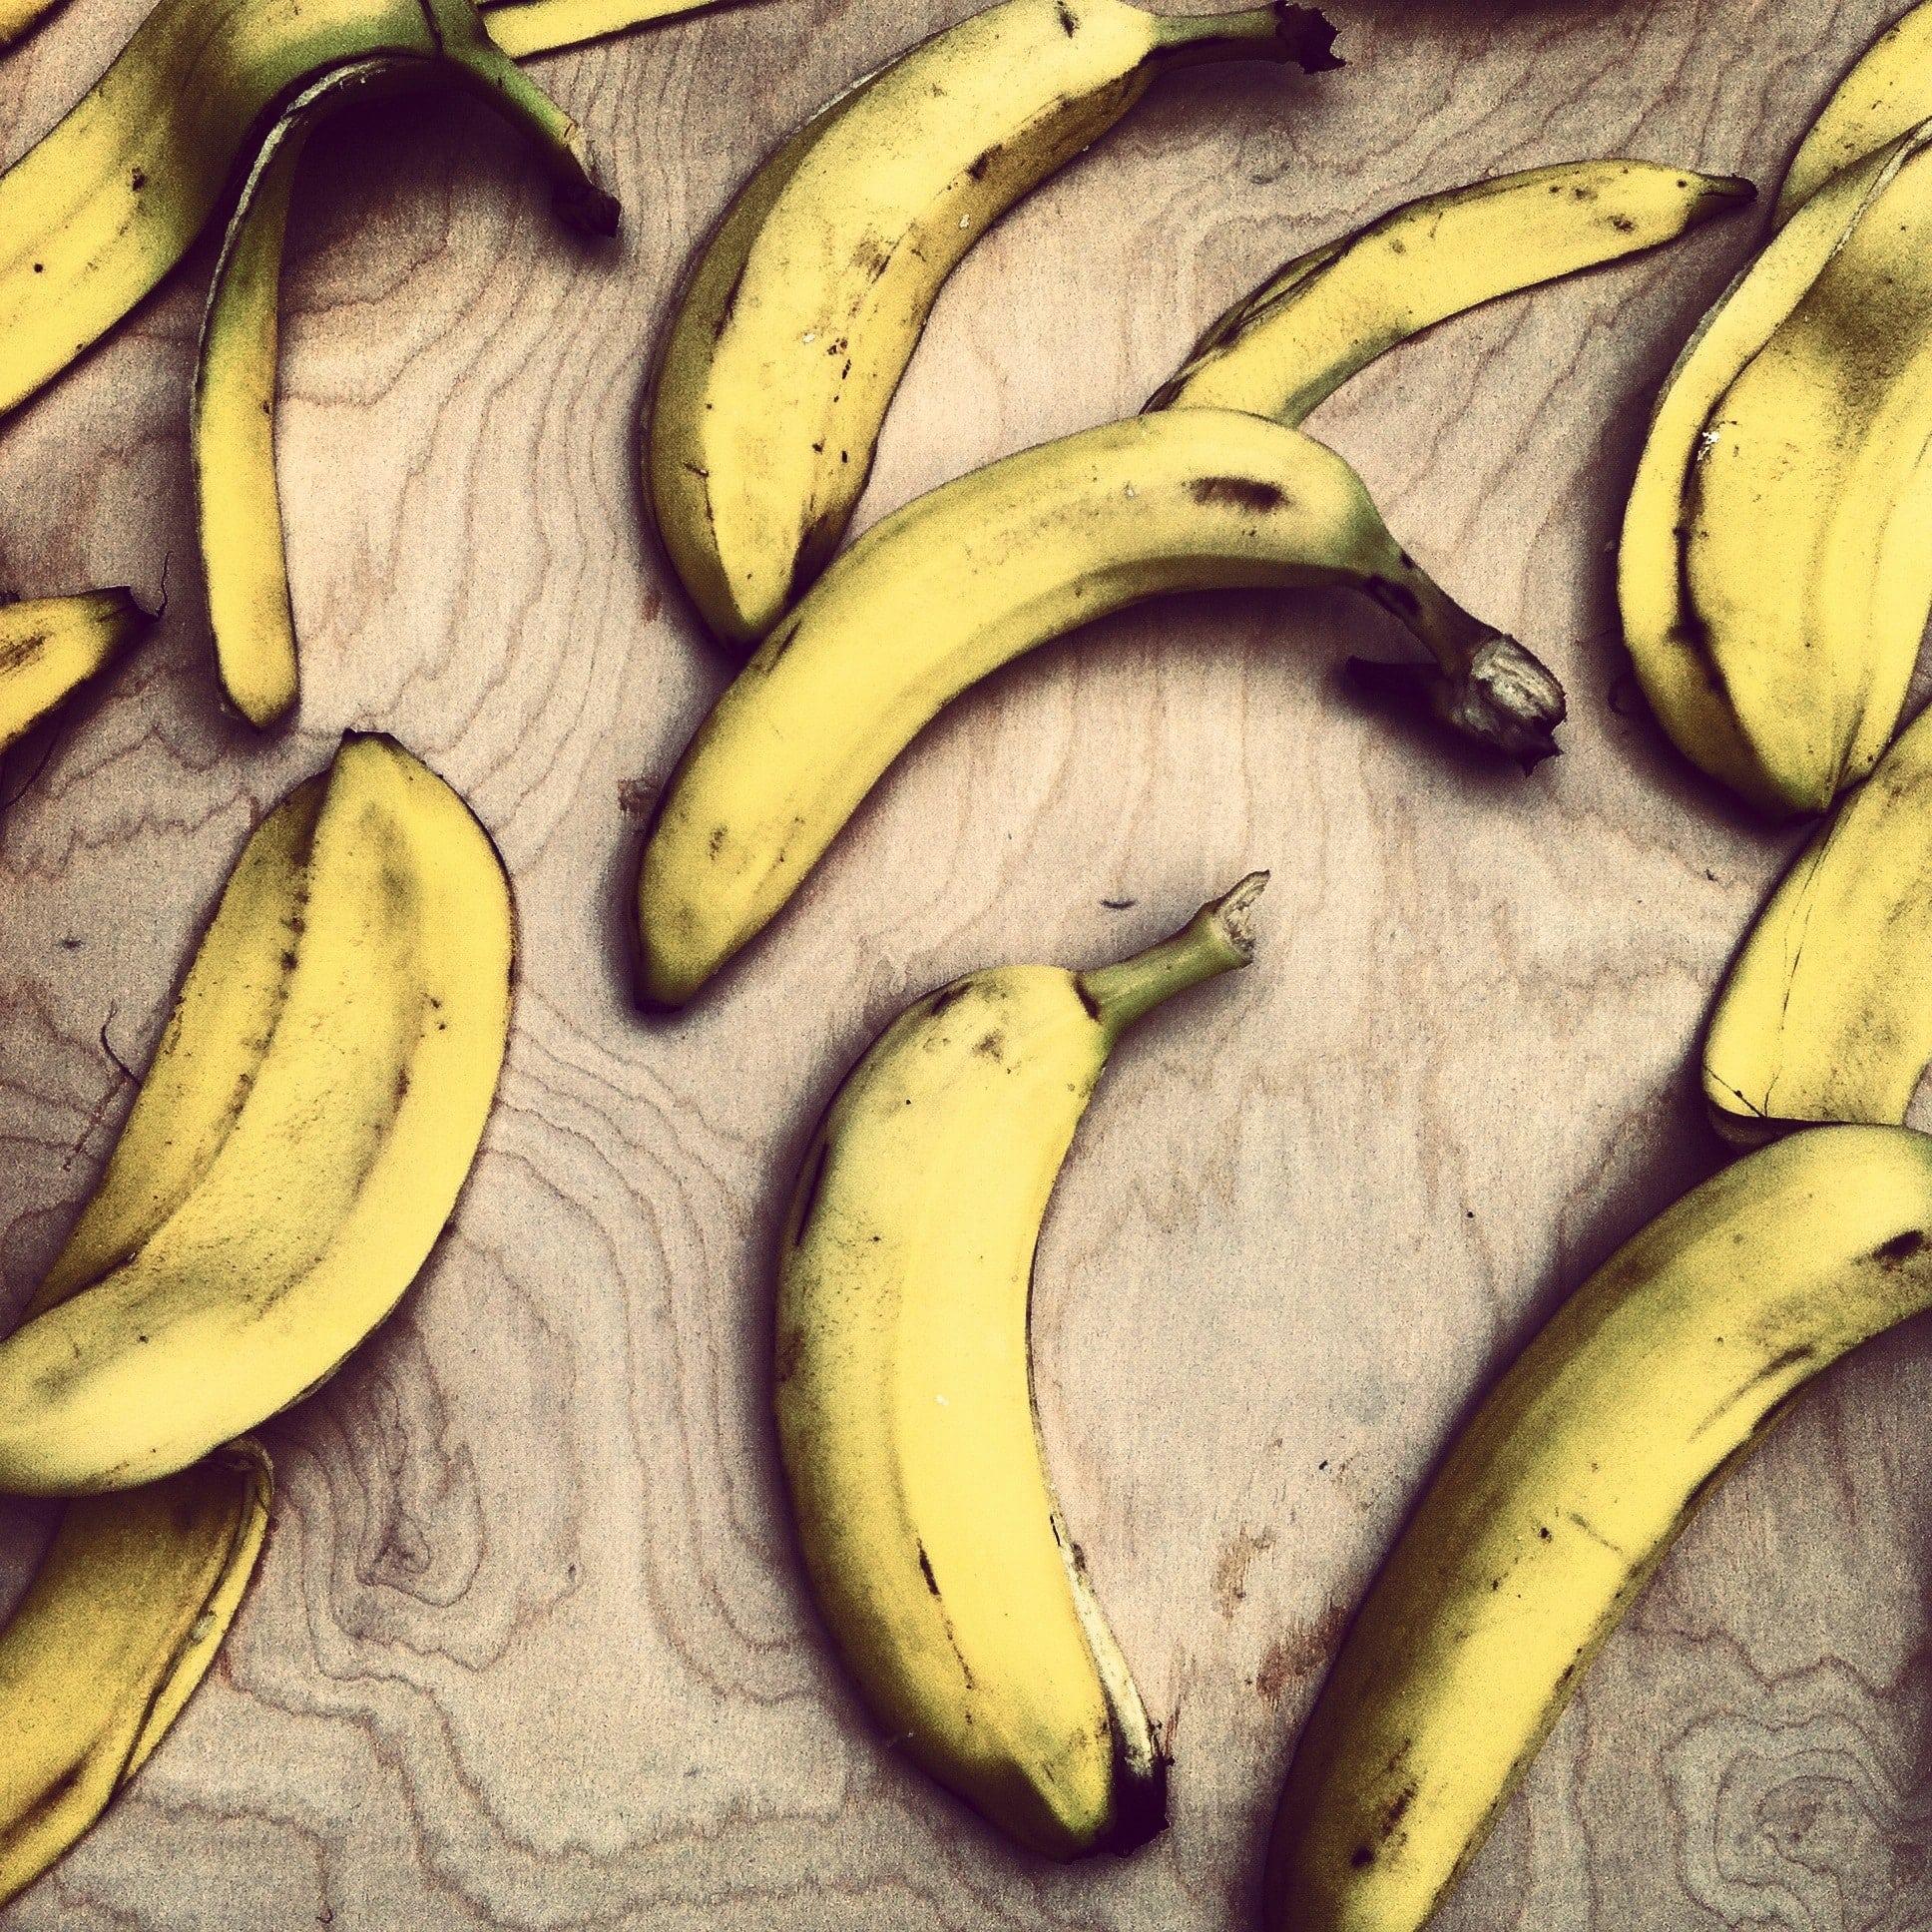 lonely-banana.jpg